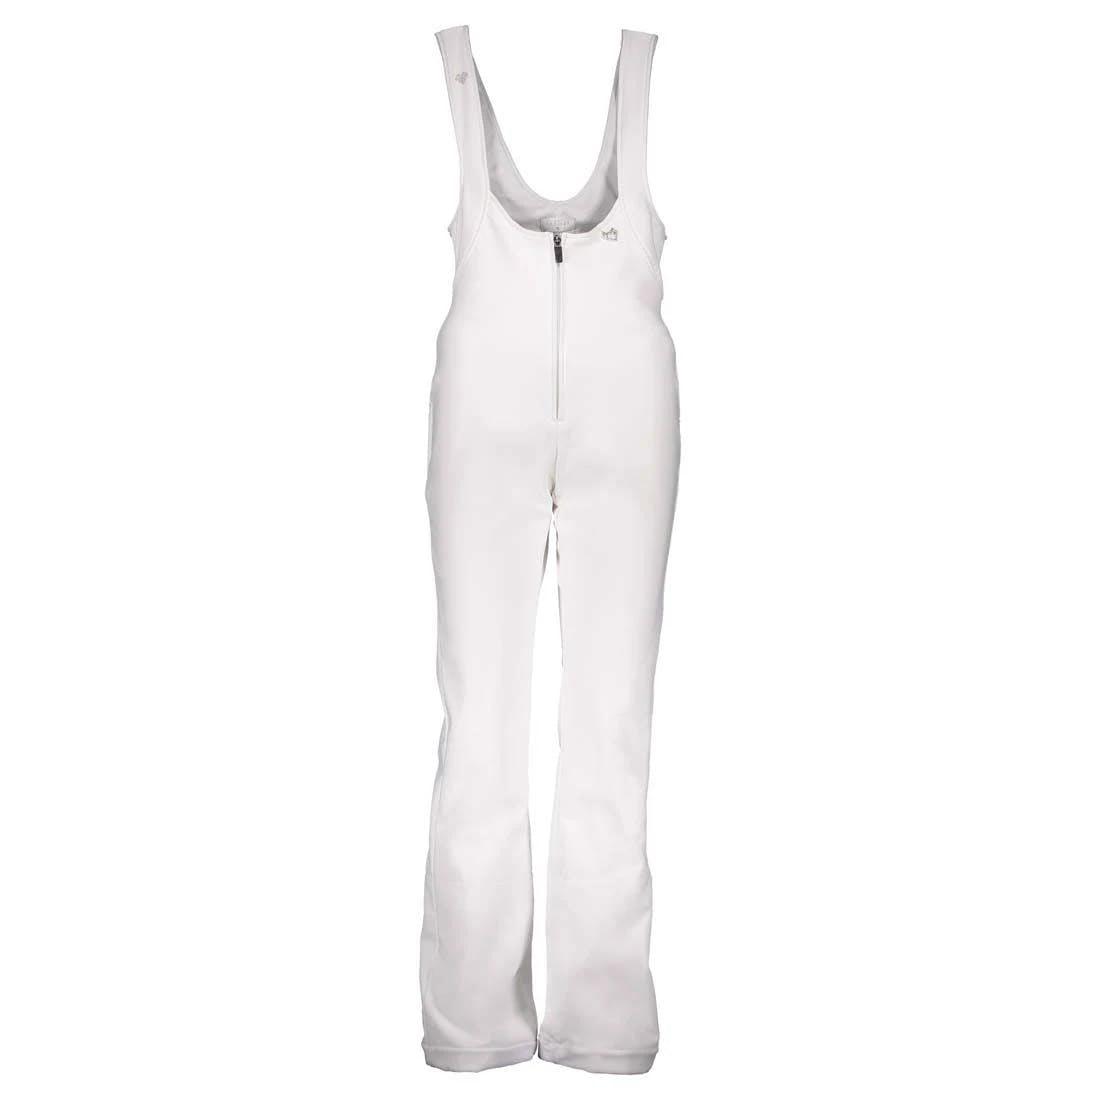 Obermeyer Women's Snell OTB Softshell Pant